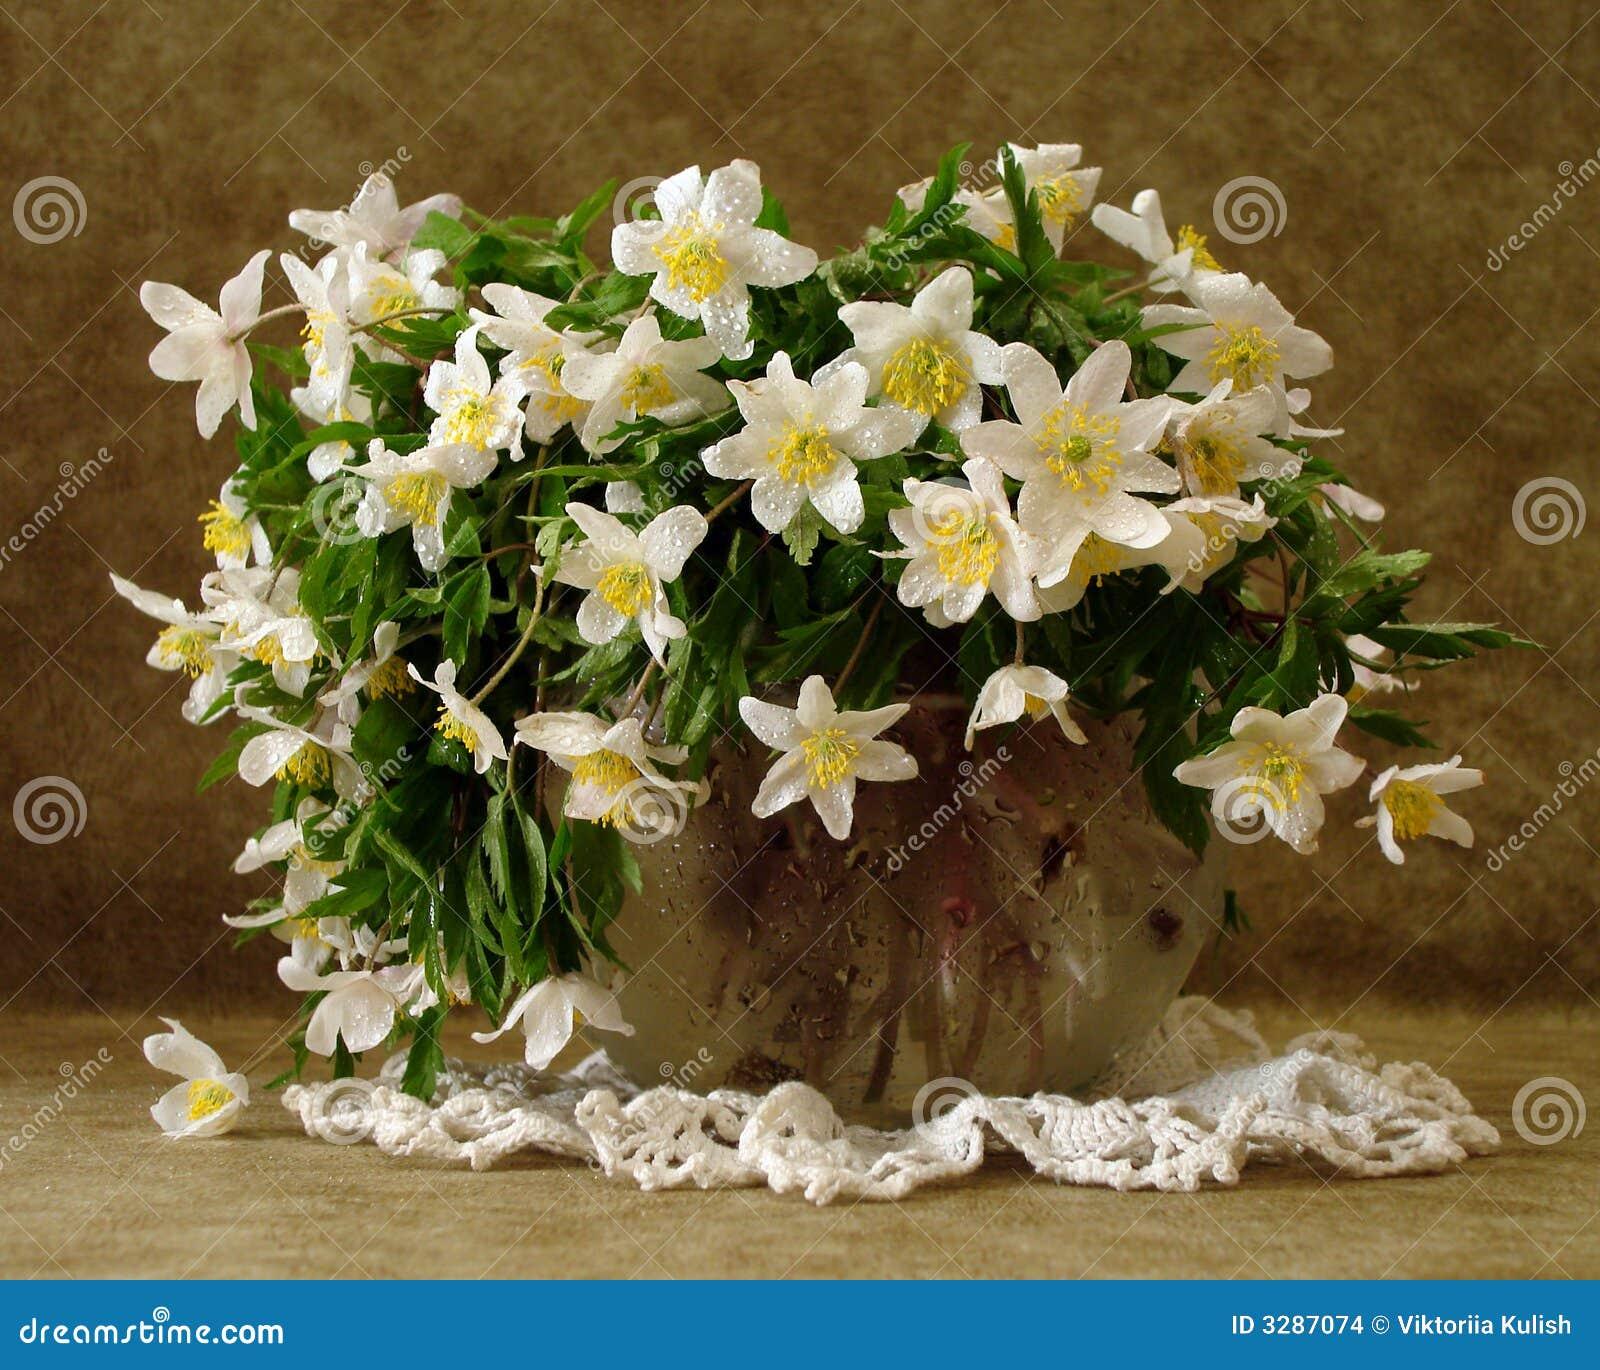 Fiori Bianchi In Vaso.Fiori Bianchi In Vaso Fotografia Stock Immagine Di Curva 3287074